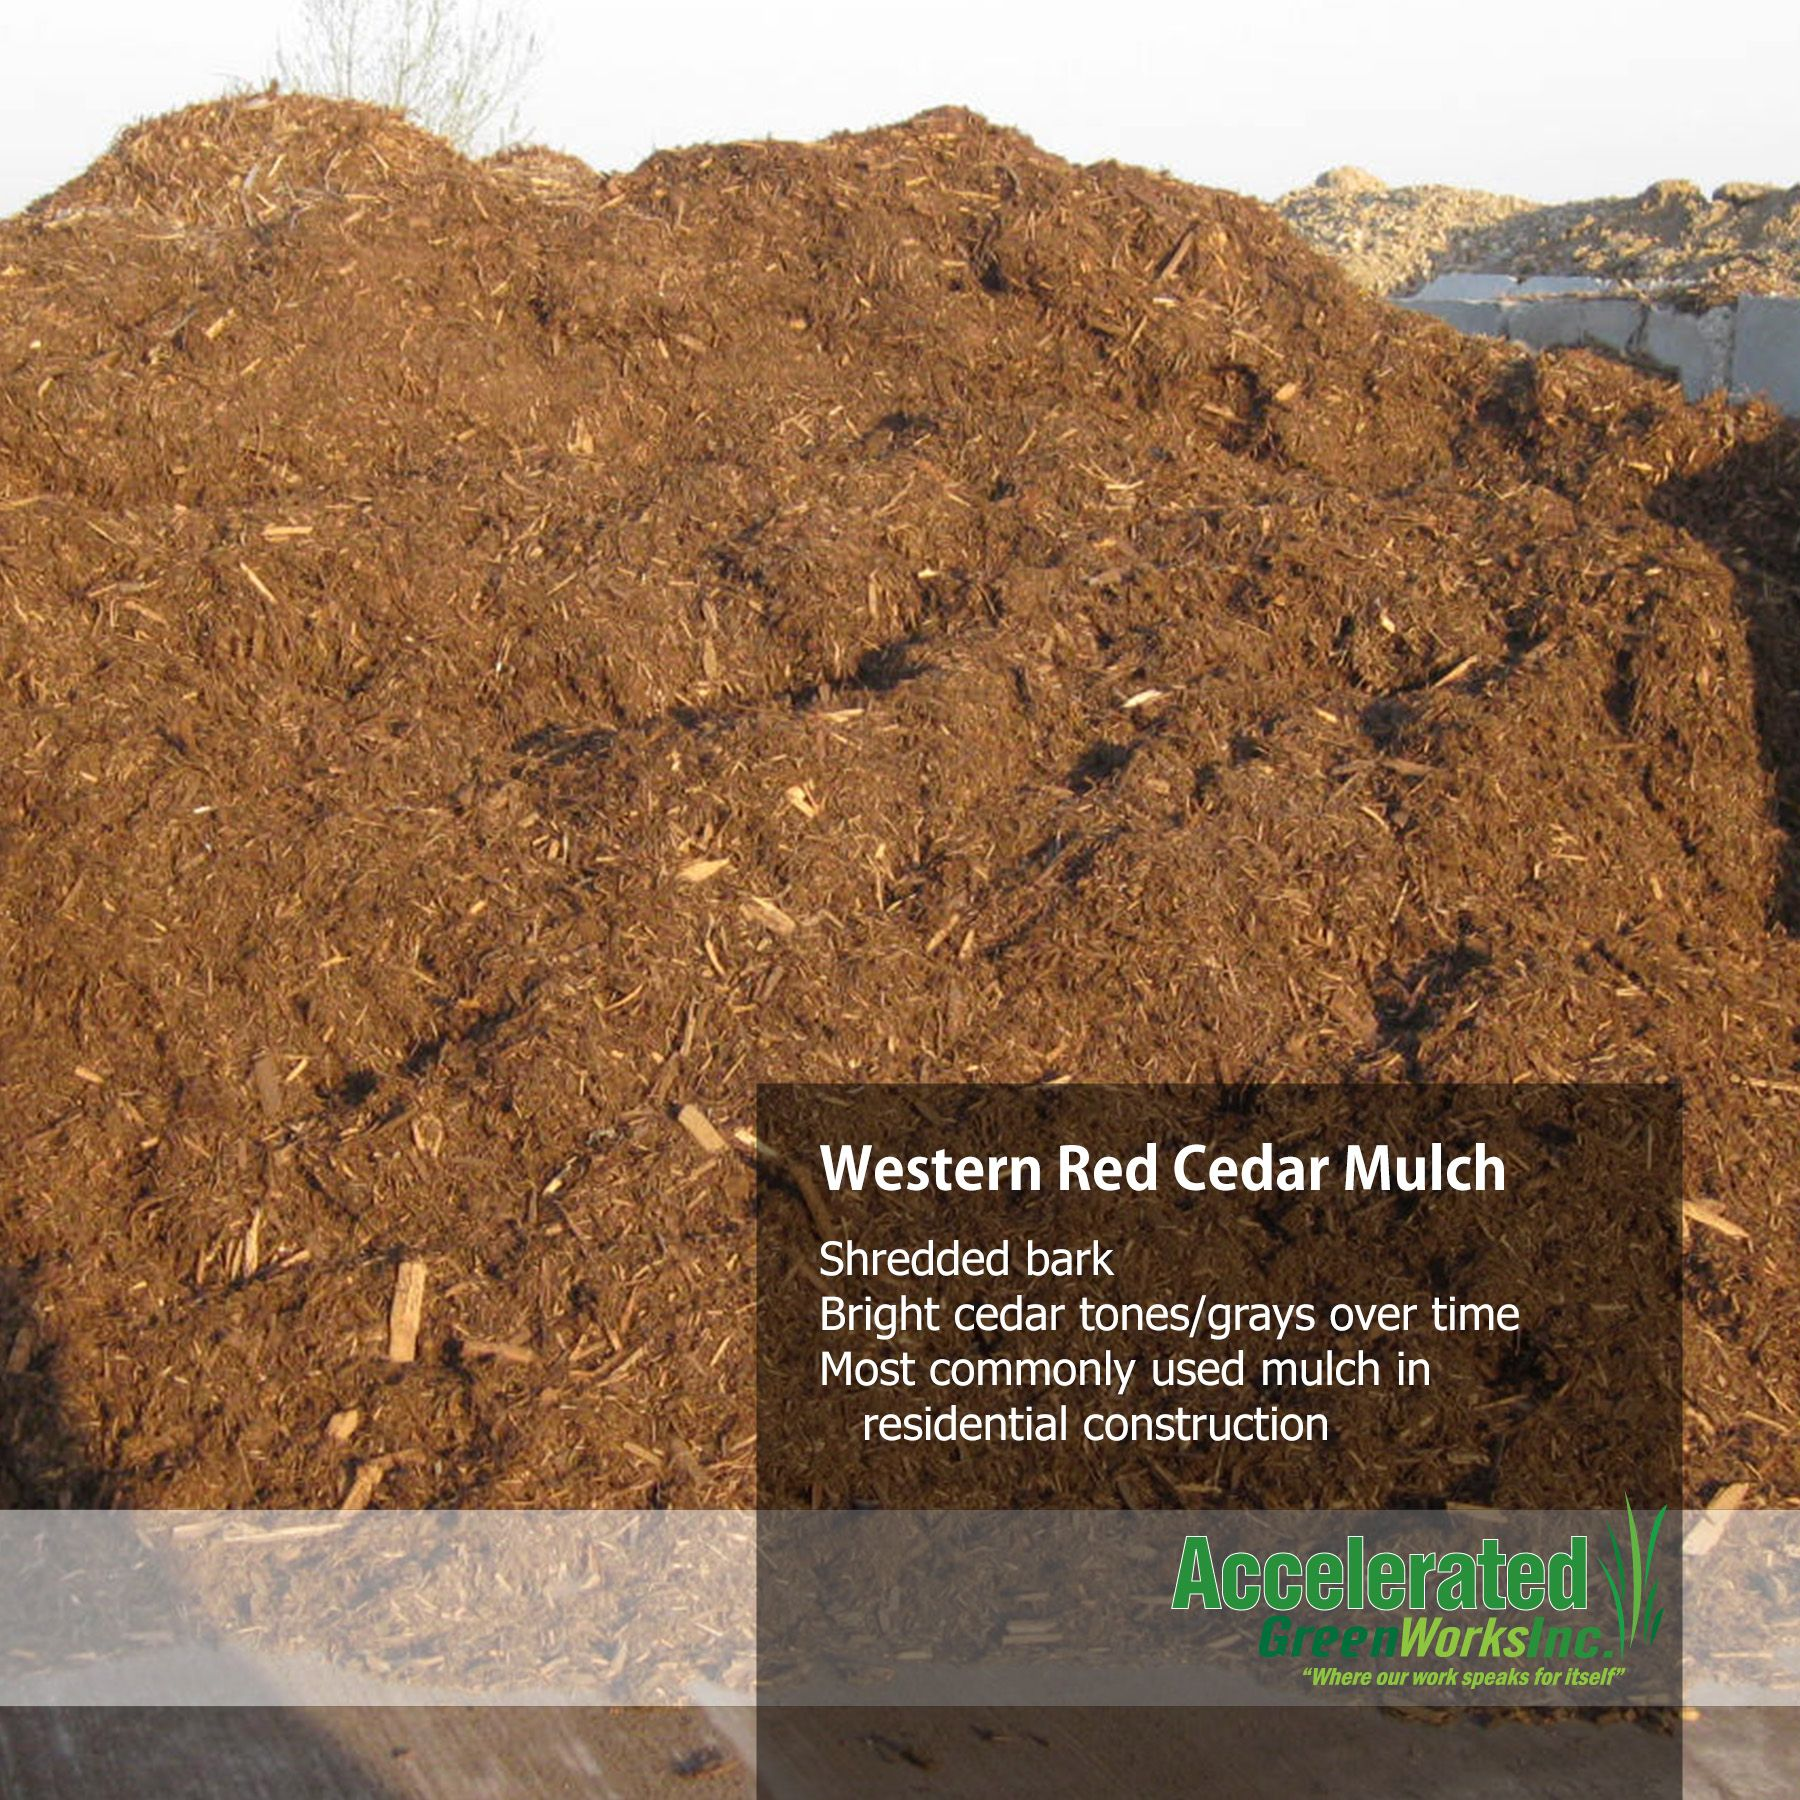 Western Red Cedar Mulch Landscaping With Rocks